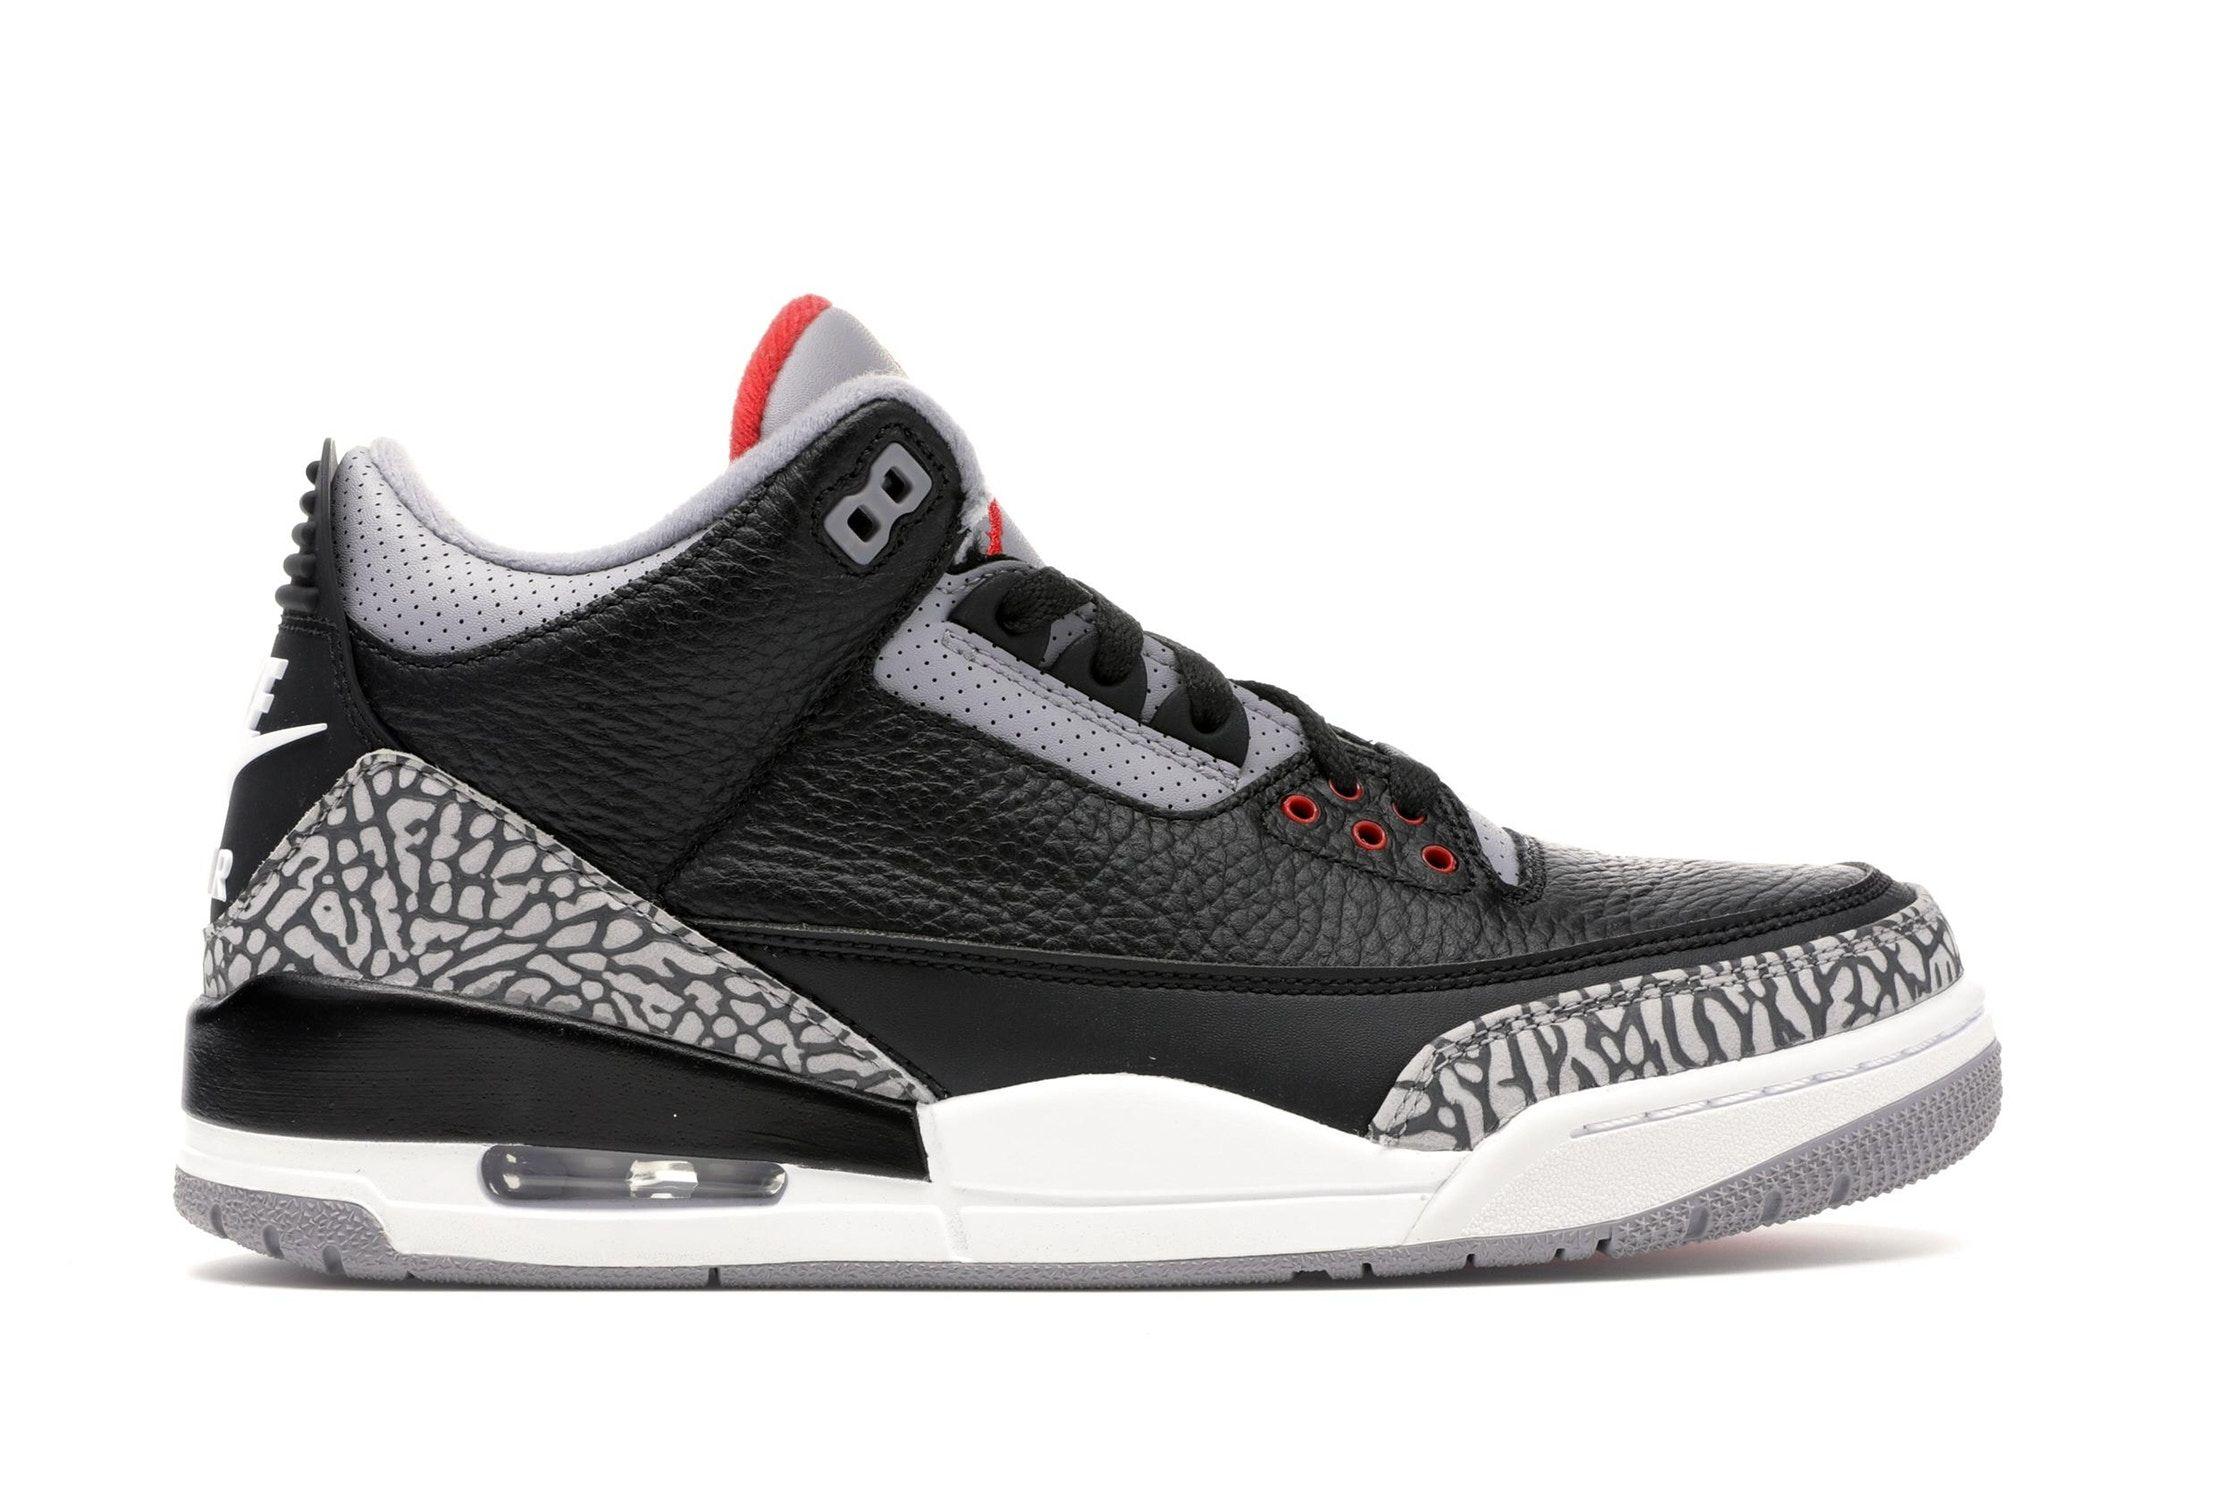 Jordan 3 Retro Black Cement 2018 With Images Air Jordans Retro